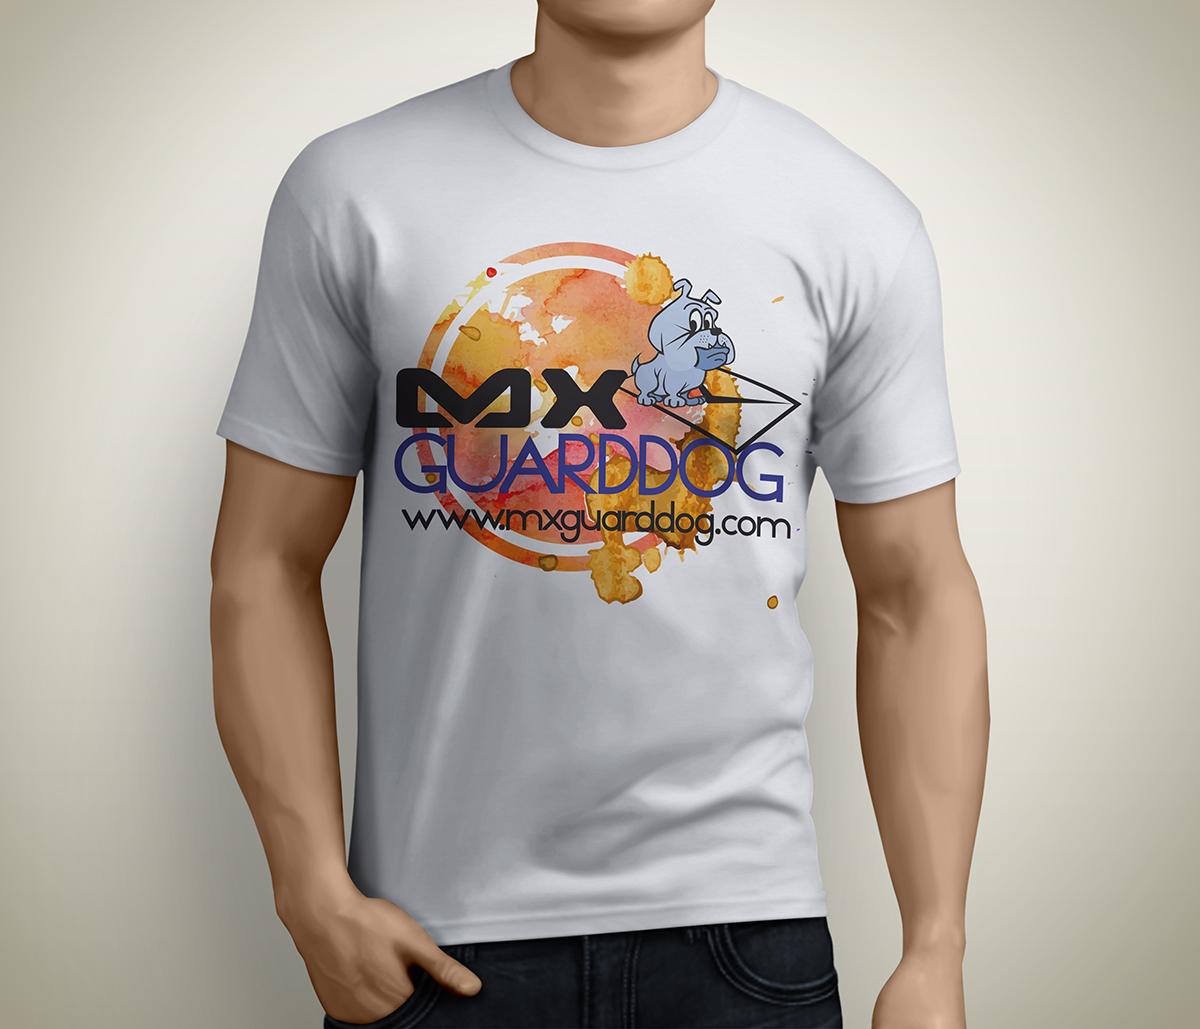 T shirt design hong kong - Playful Colorful T Shirt Design For Company In Hong Kong Design 5542875